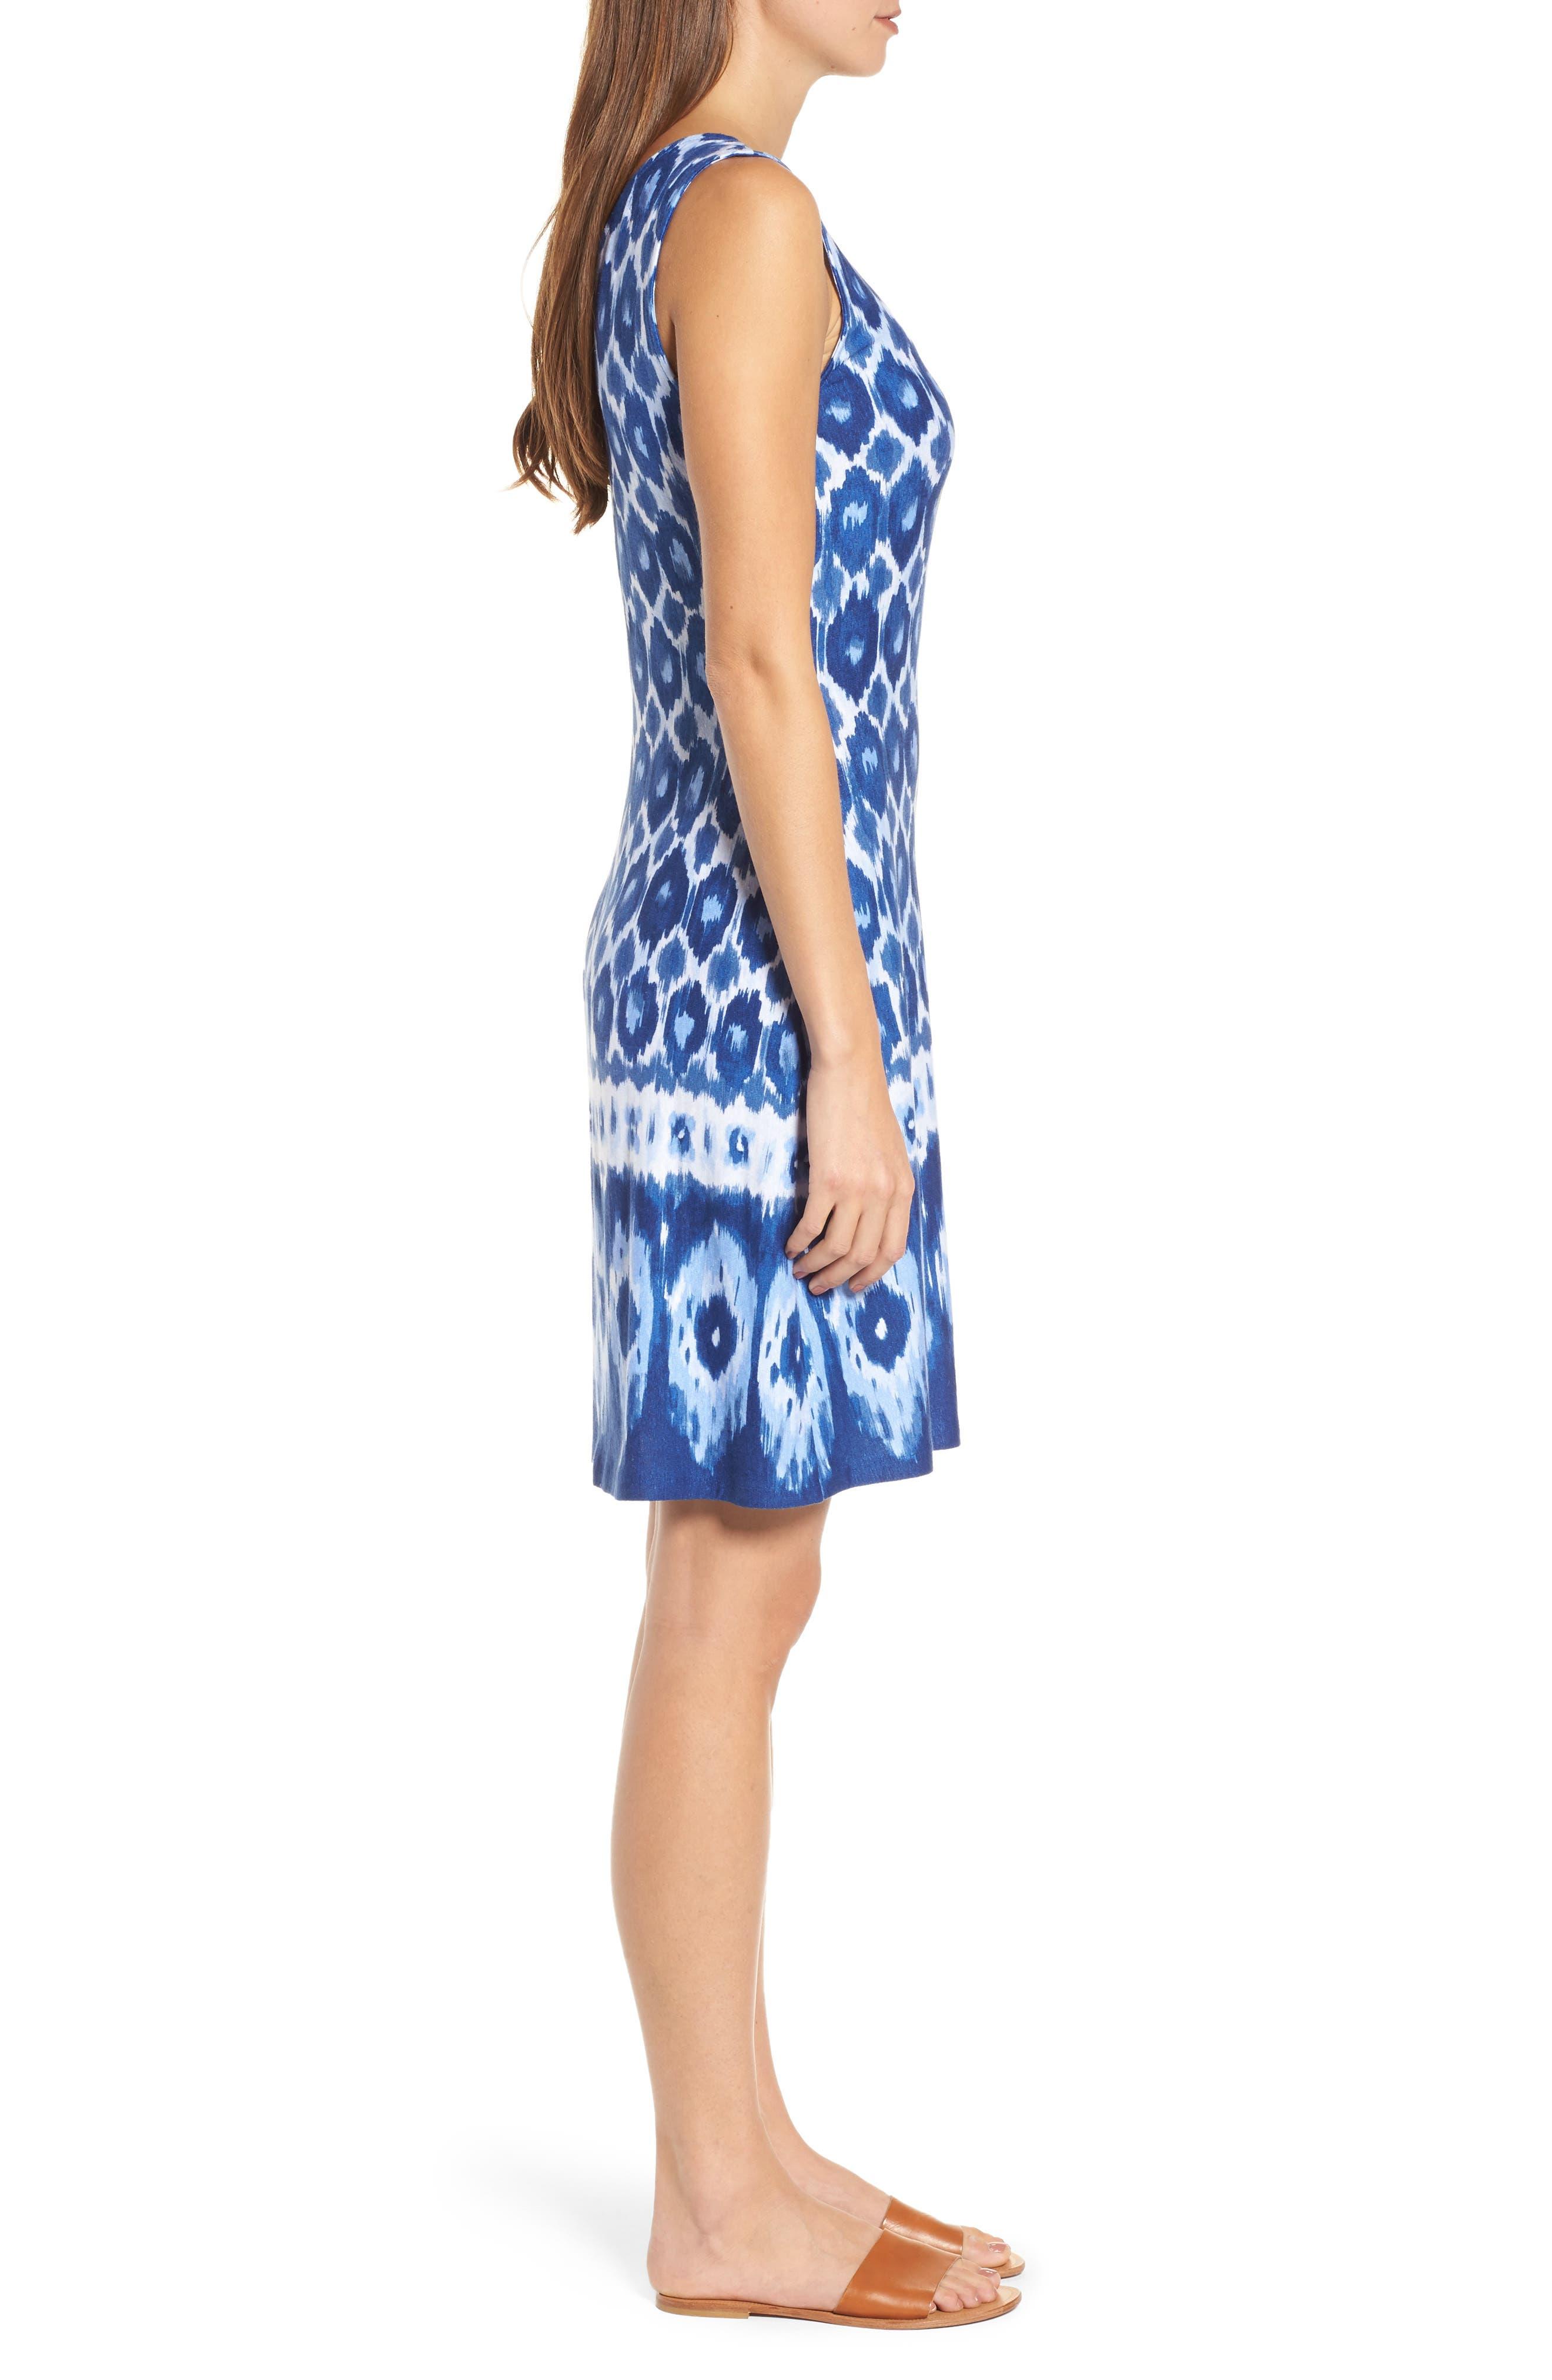 Innercoastal Ikat Sleeveless Dress,                             Alternate thumbnail 3, color,                             KINGDOM BLUE